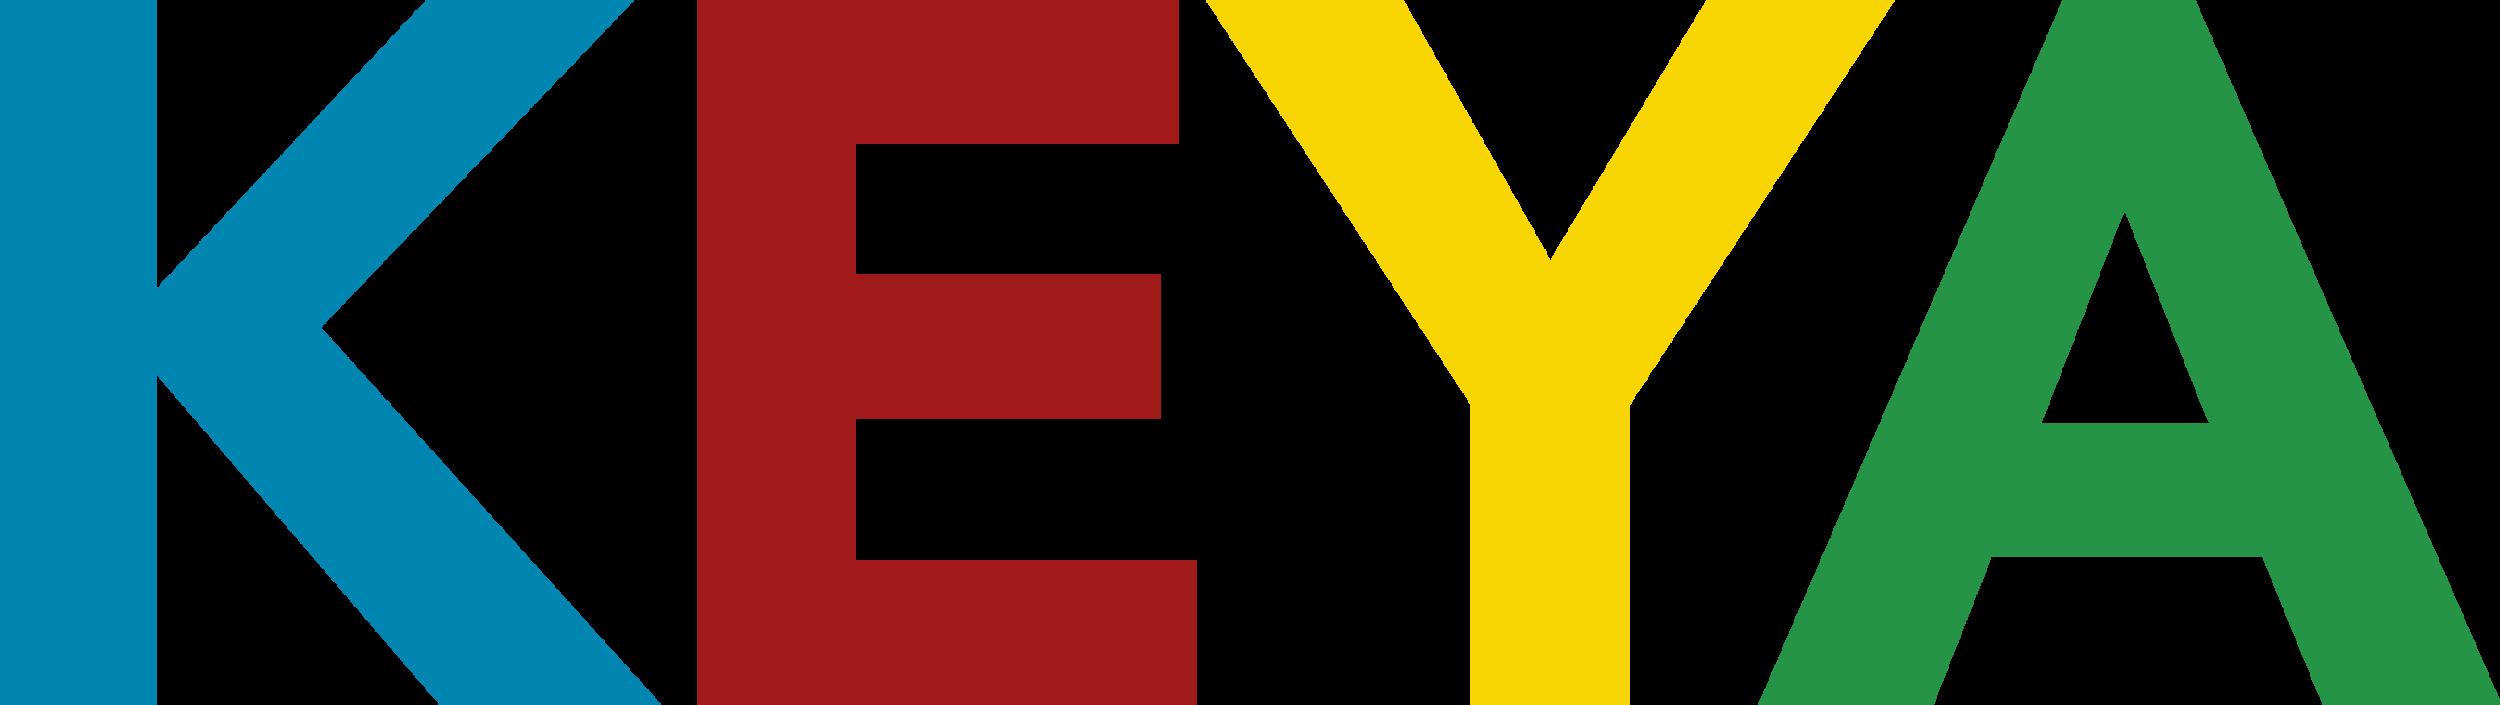 Keya_Website_Logo_1500.png